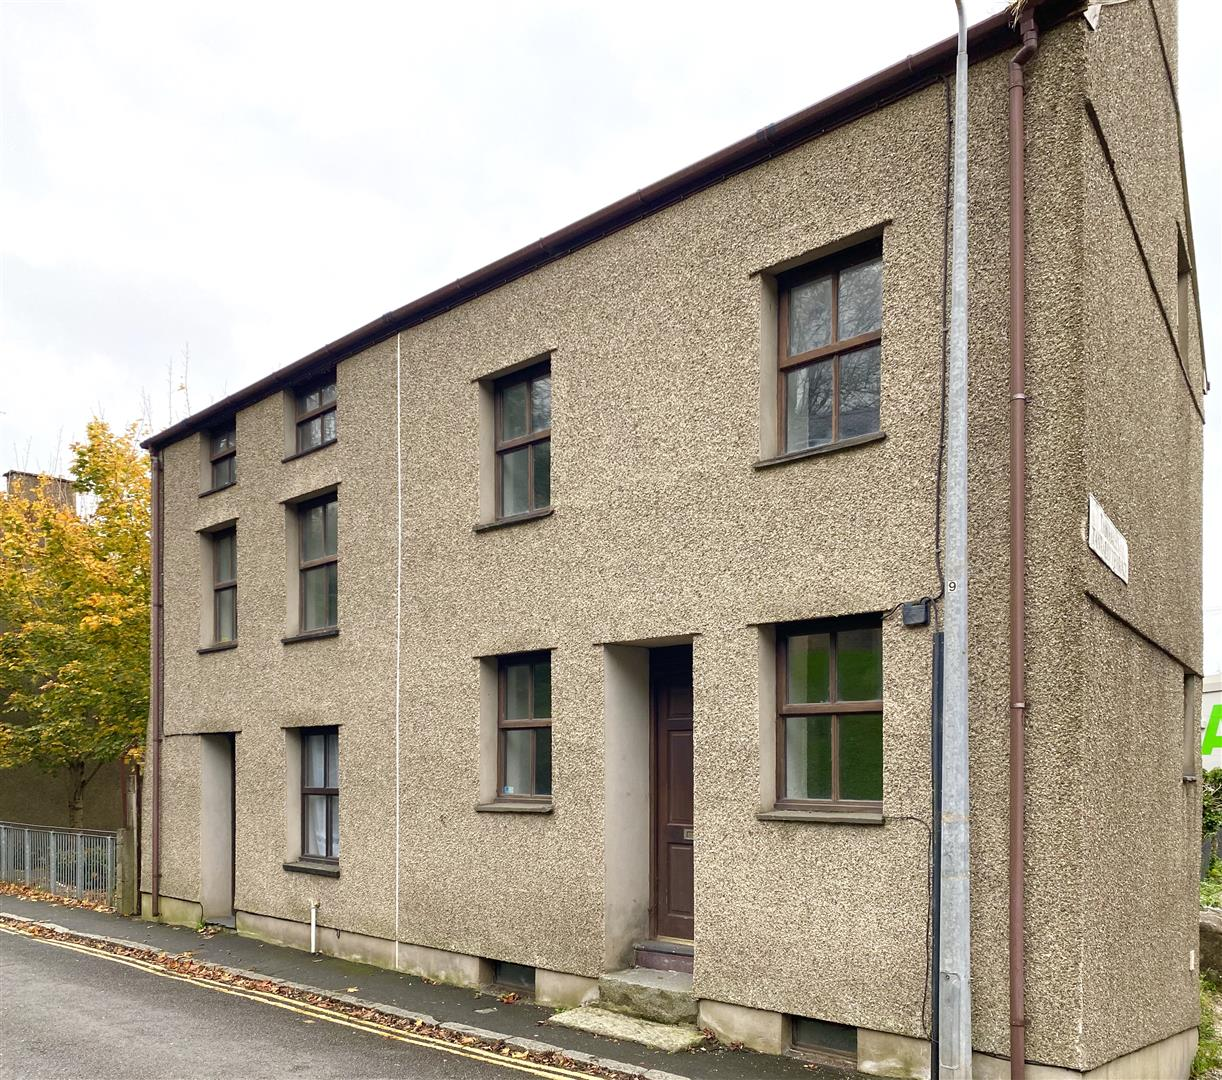 North Street, Pwllheli